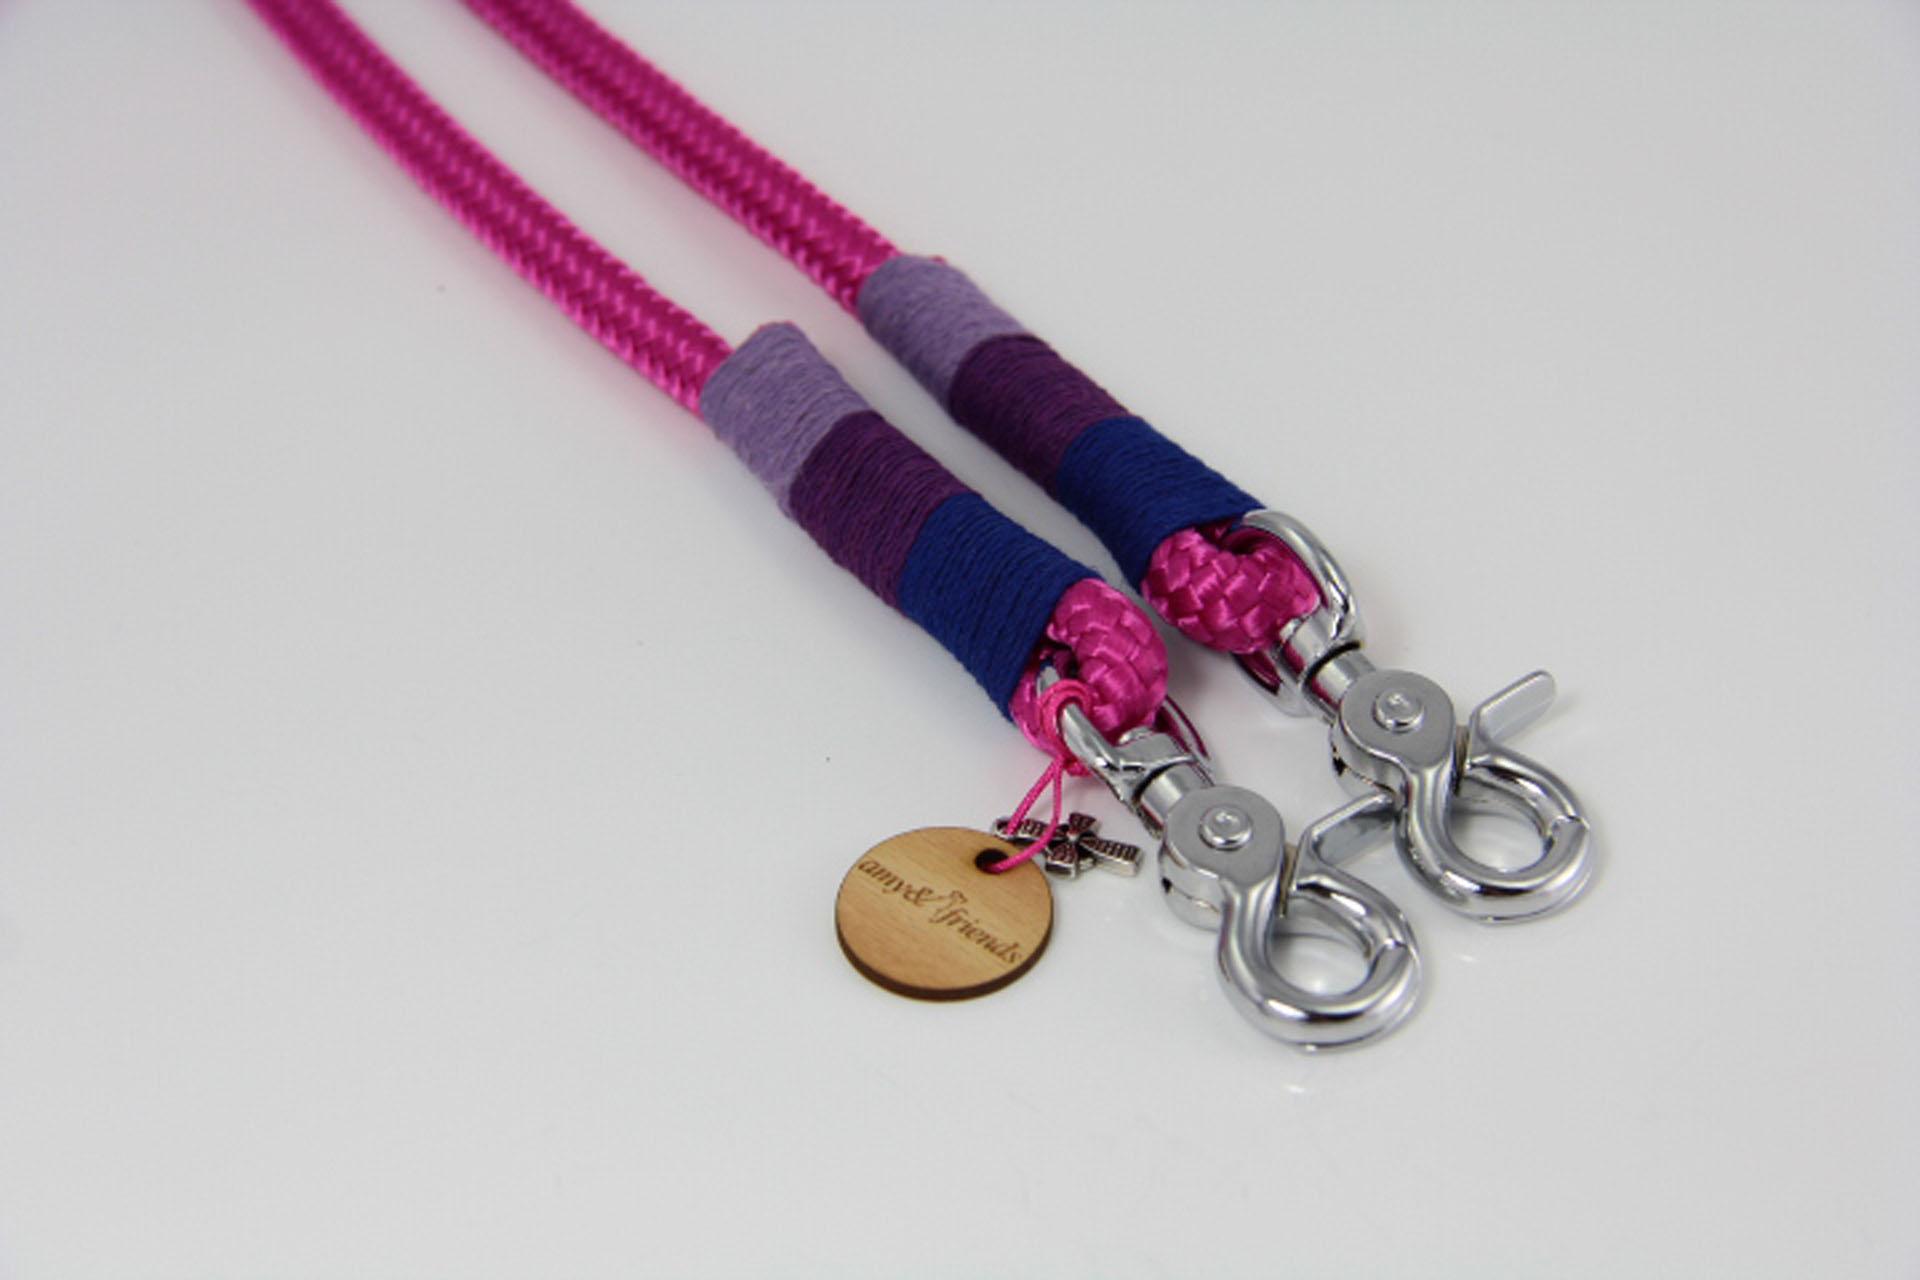 Tauleine-amy-and-friends-fuchsia-dunkelblau-purple-lavendel